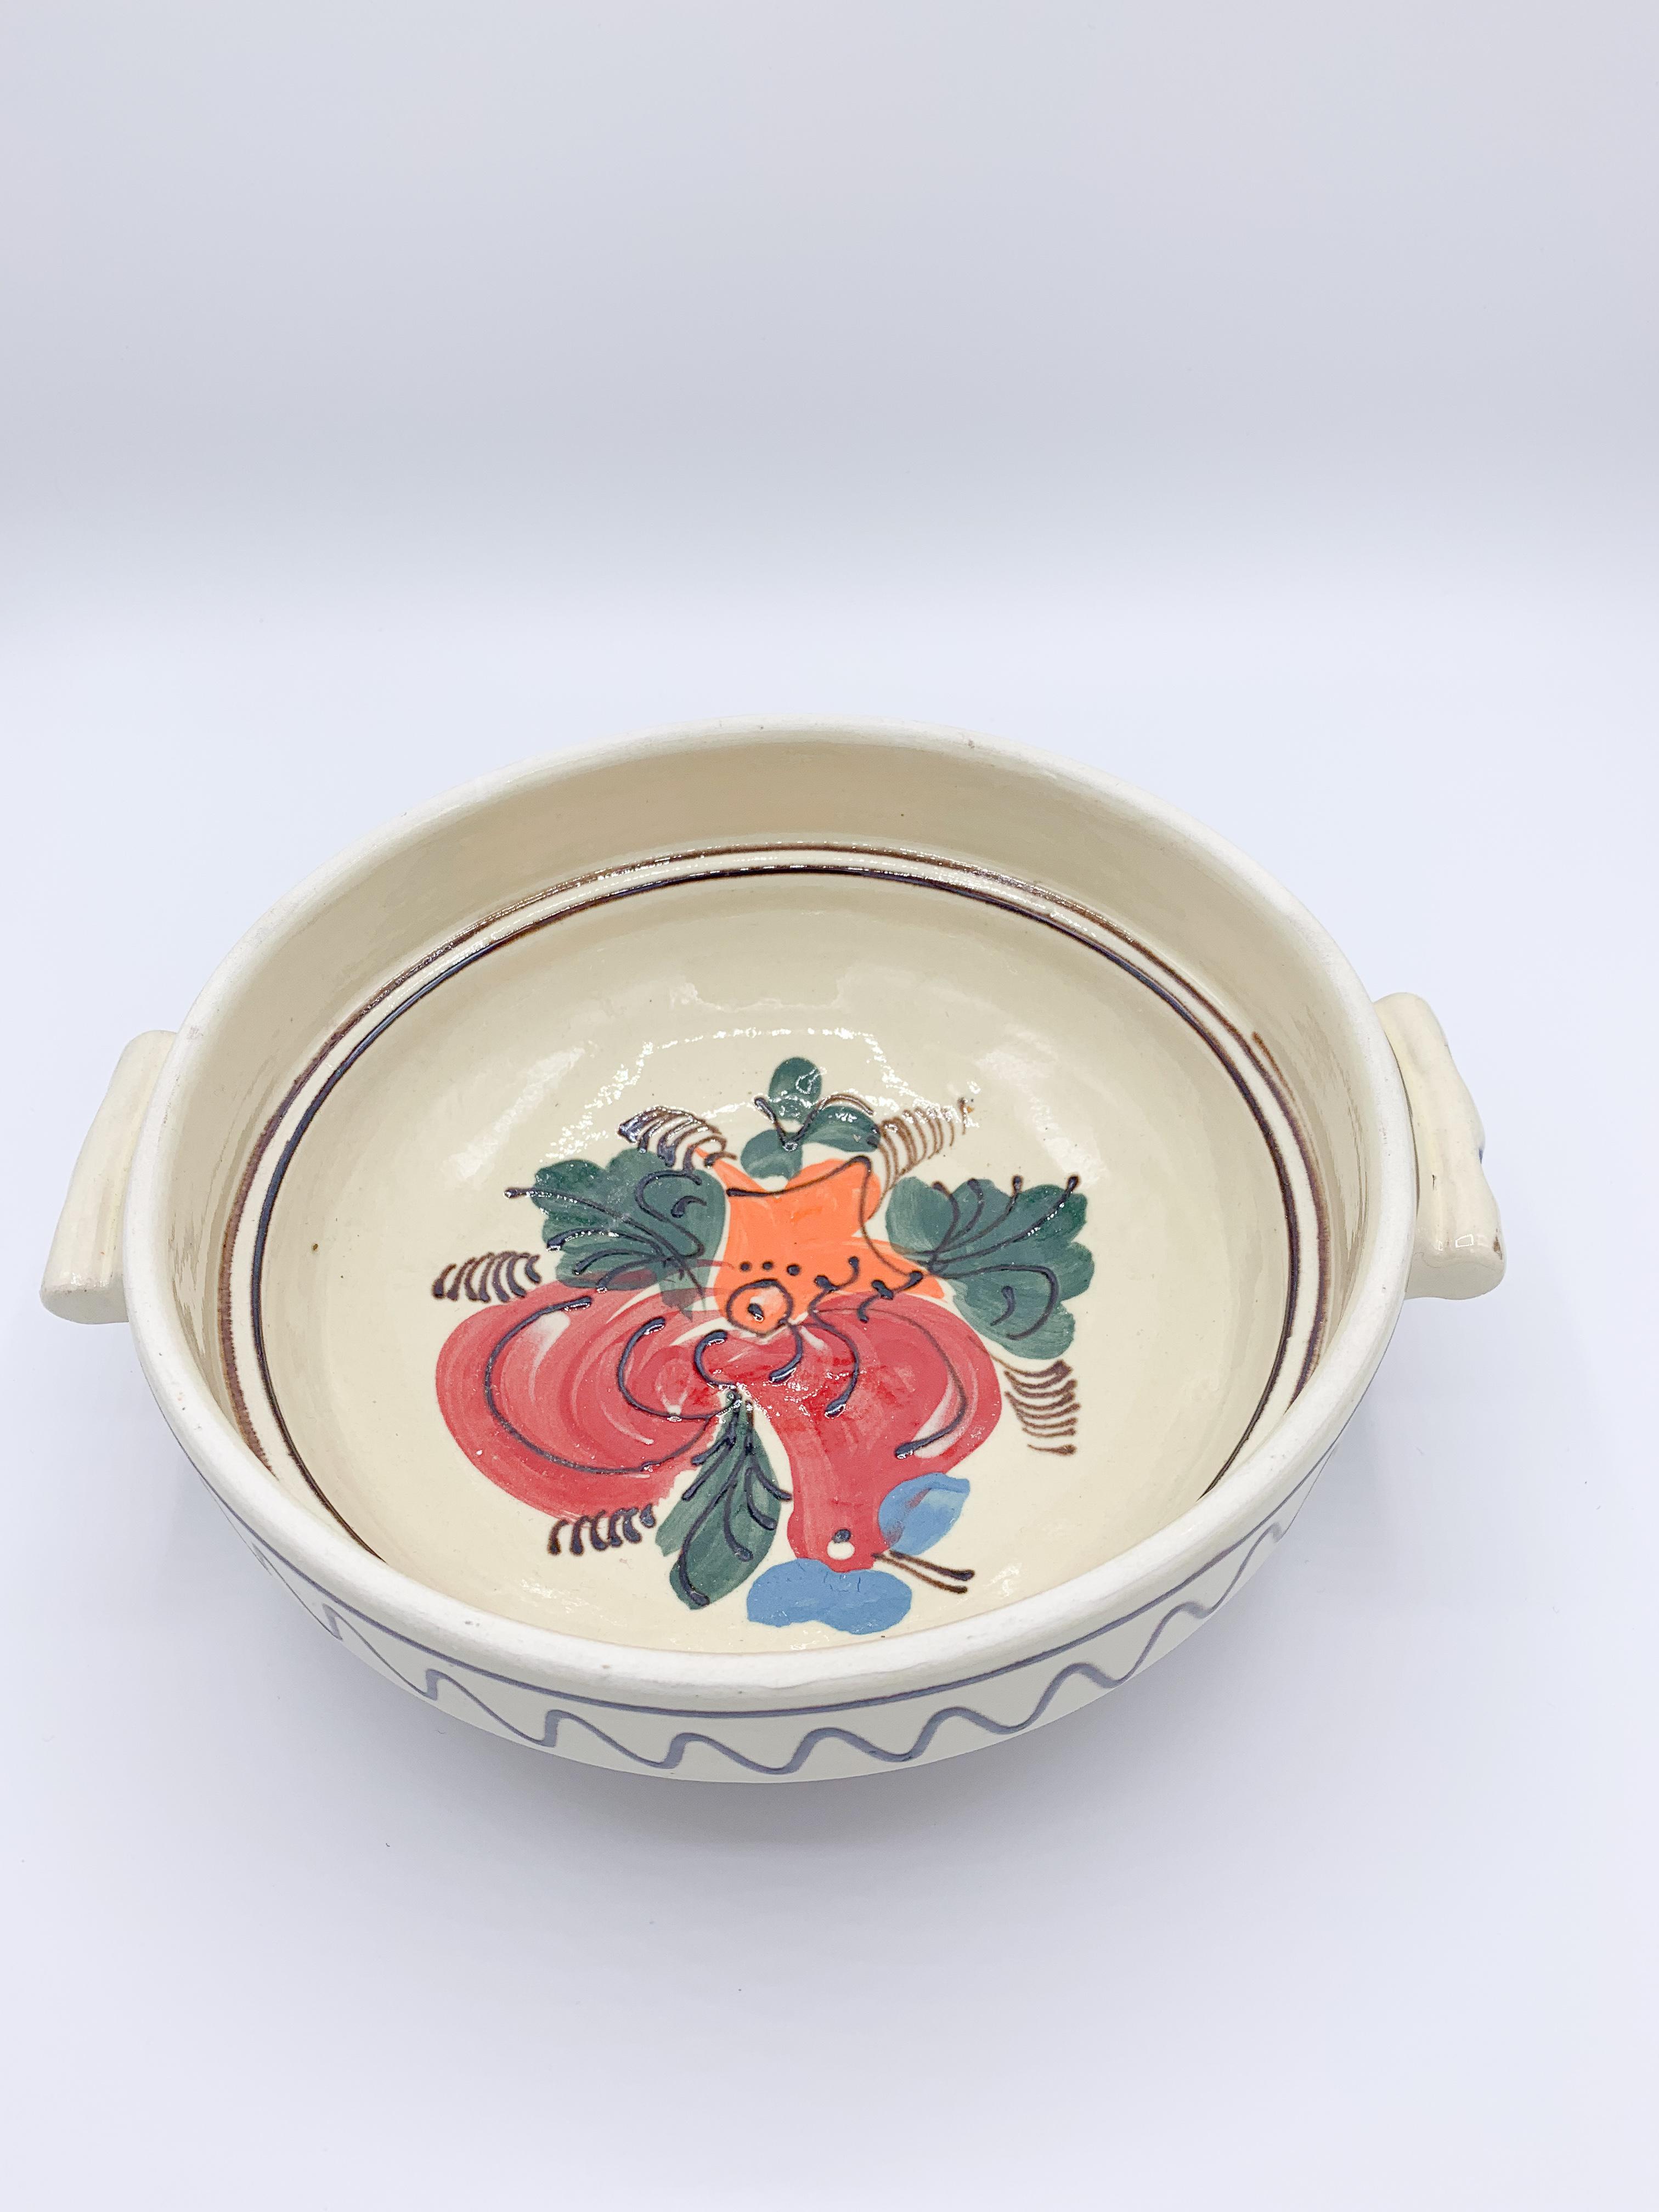 Castron traditional din ceramica de corund [2]